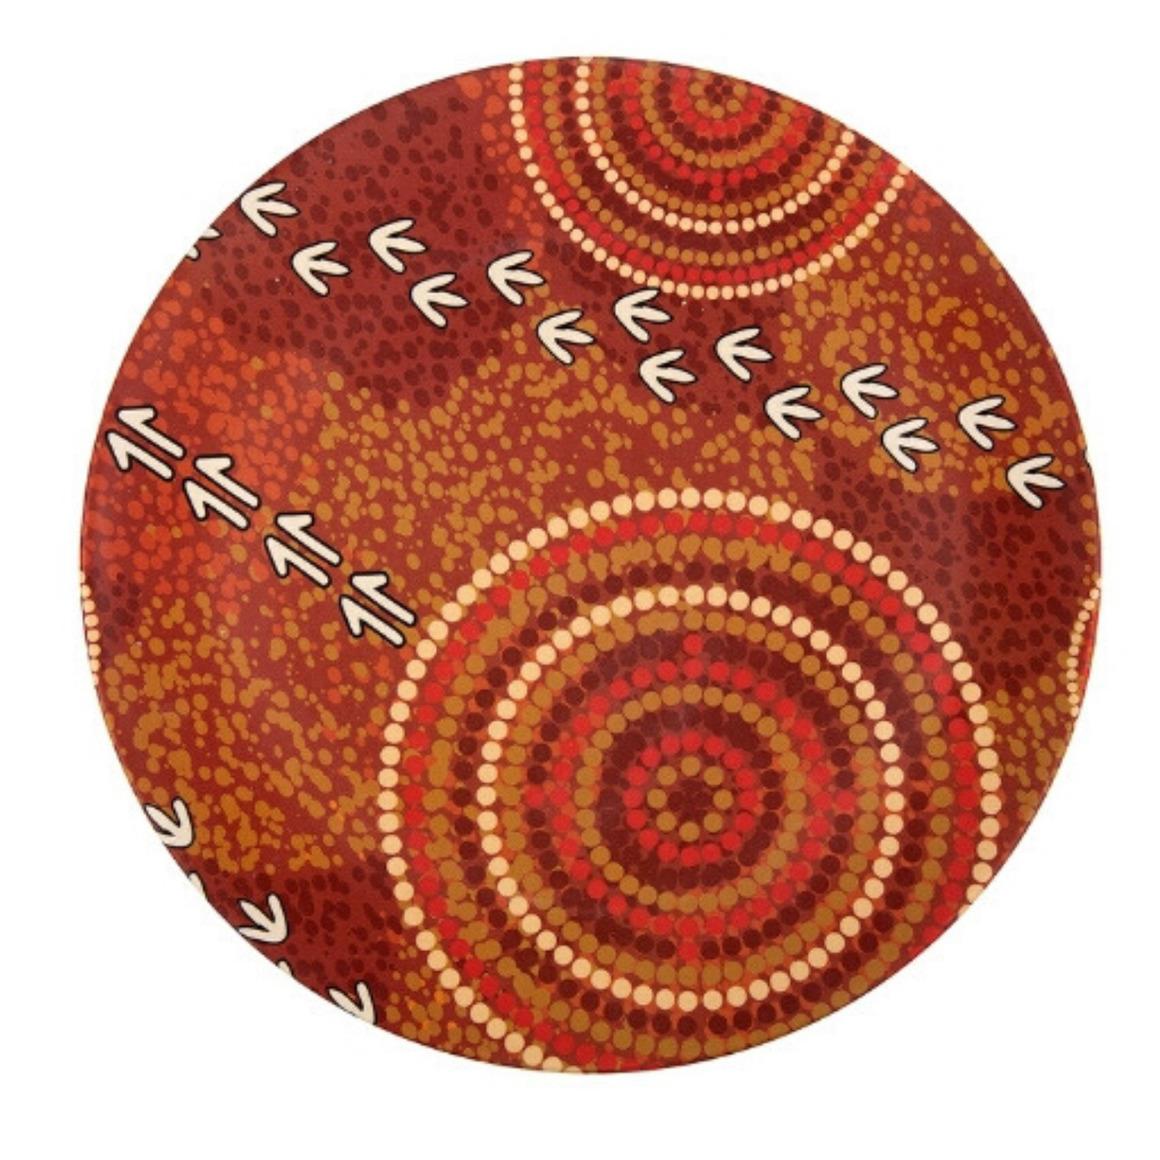 Plate Bamboo Aboriginal Design - Dry Design - Luther Cora (Set of 2)   Trada Marketplace